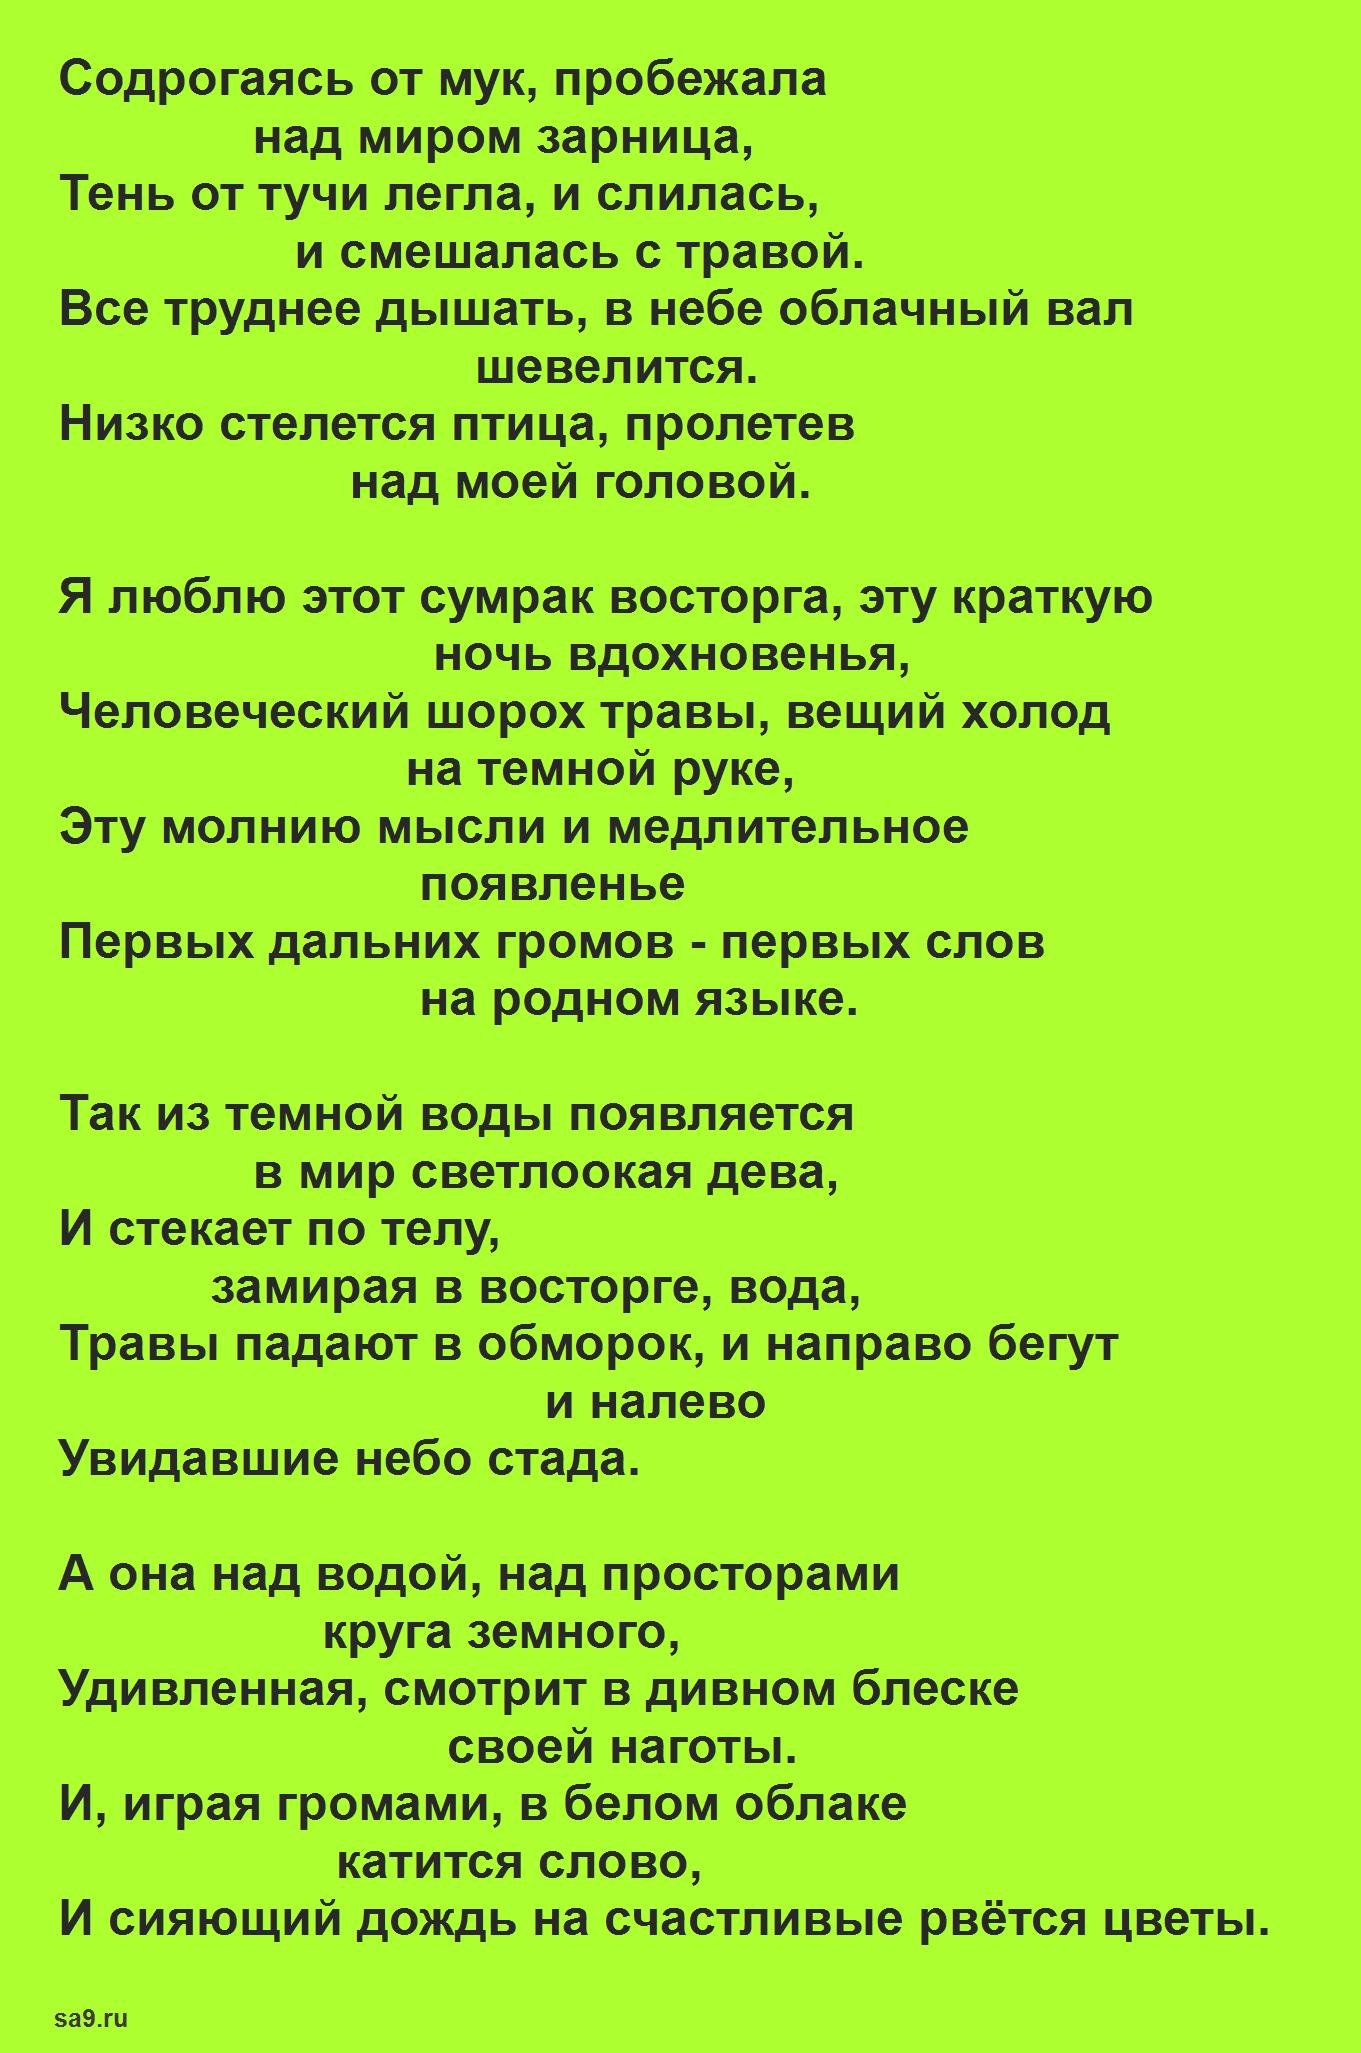 Заболоцкий стихи 16 строк - Гроза